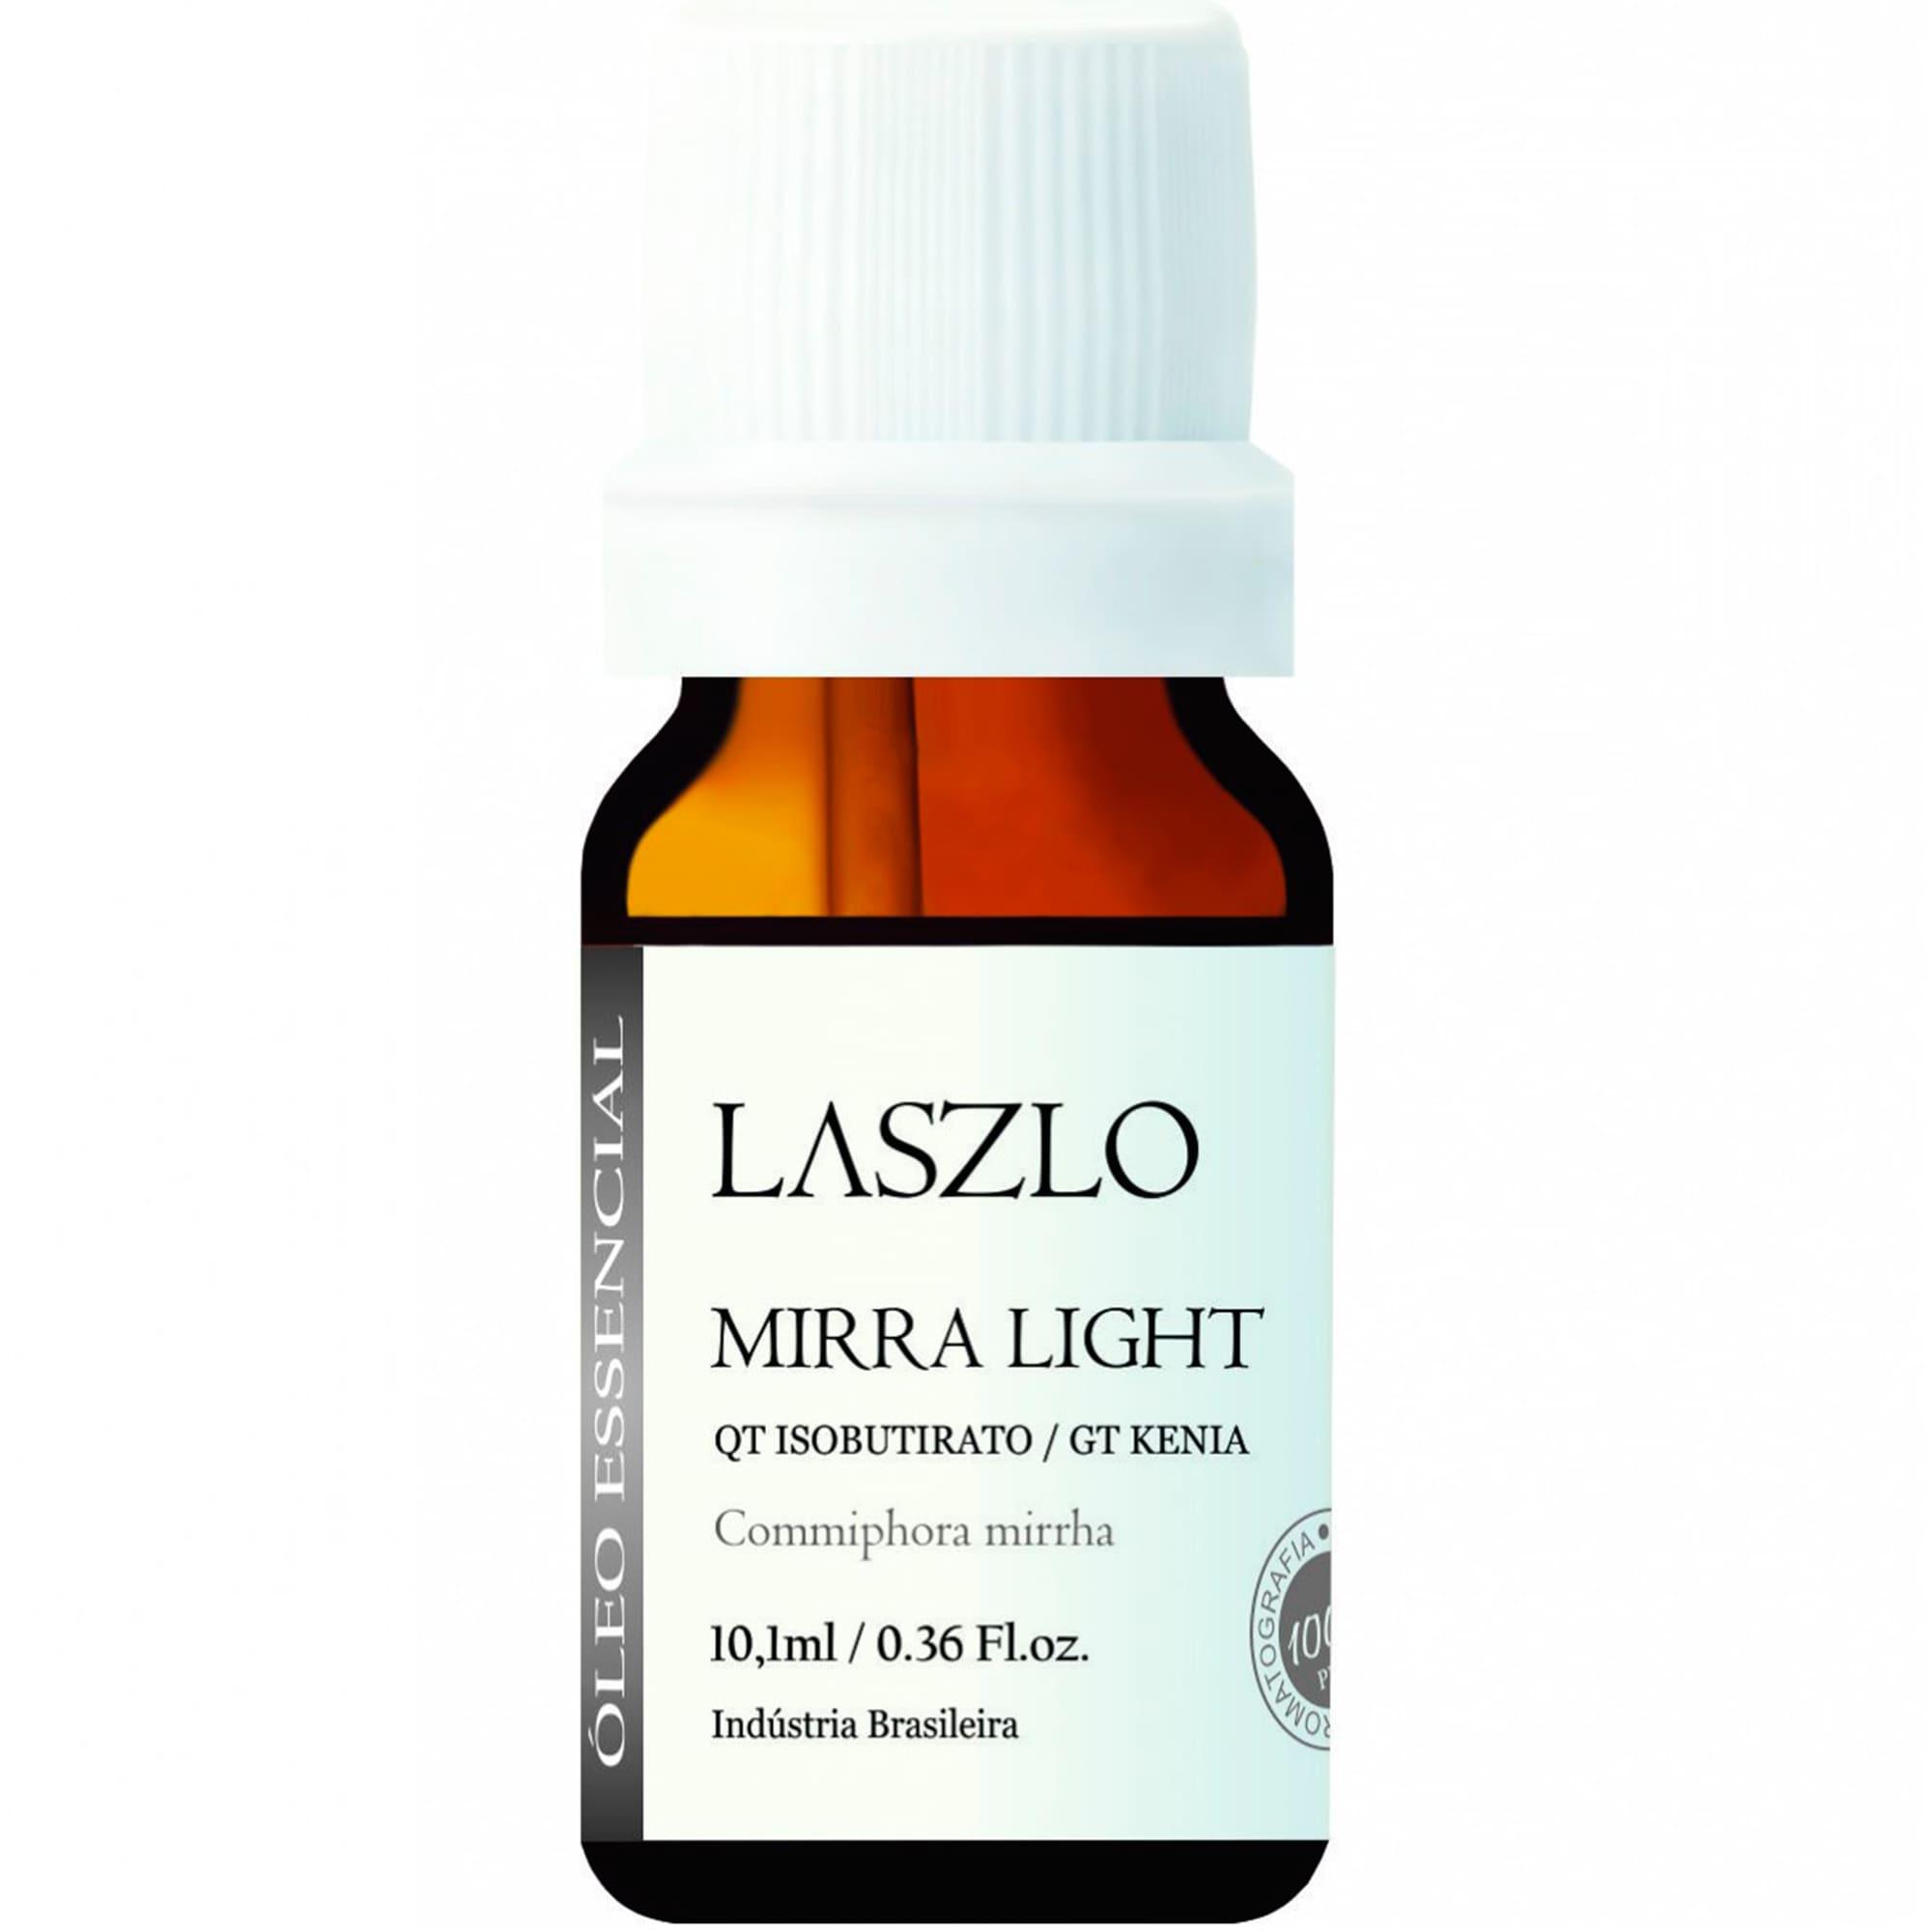 Óleo Essencial Mirra Light 10,1ml - Laszlo